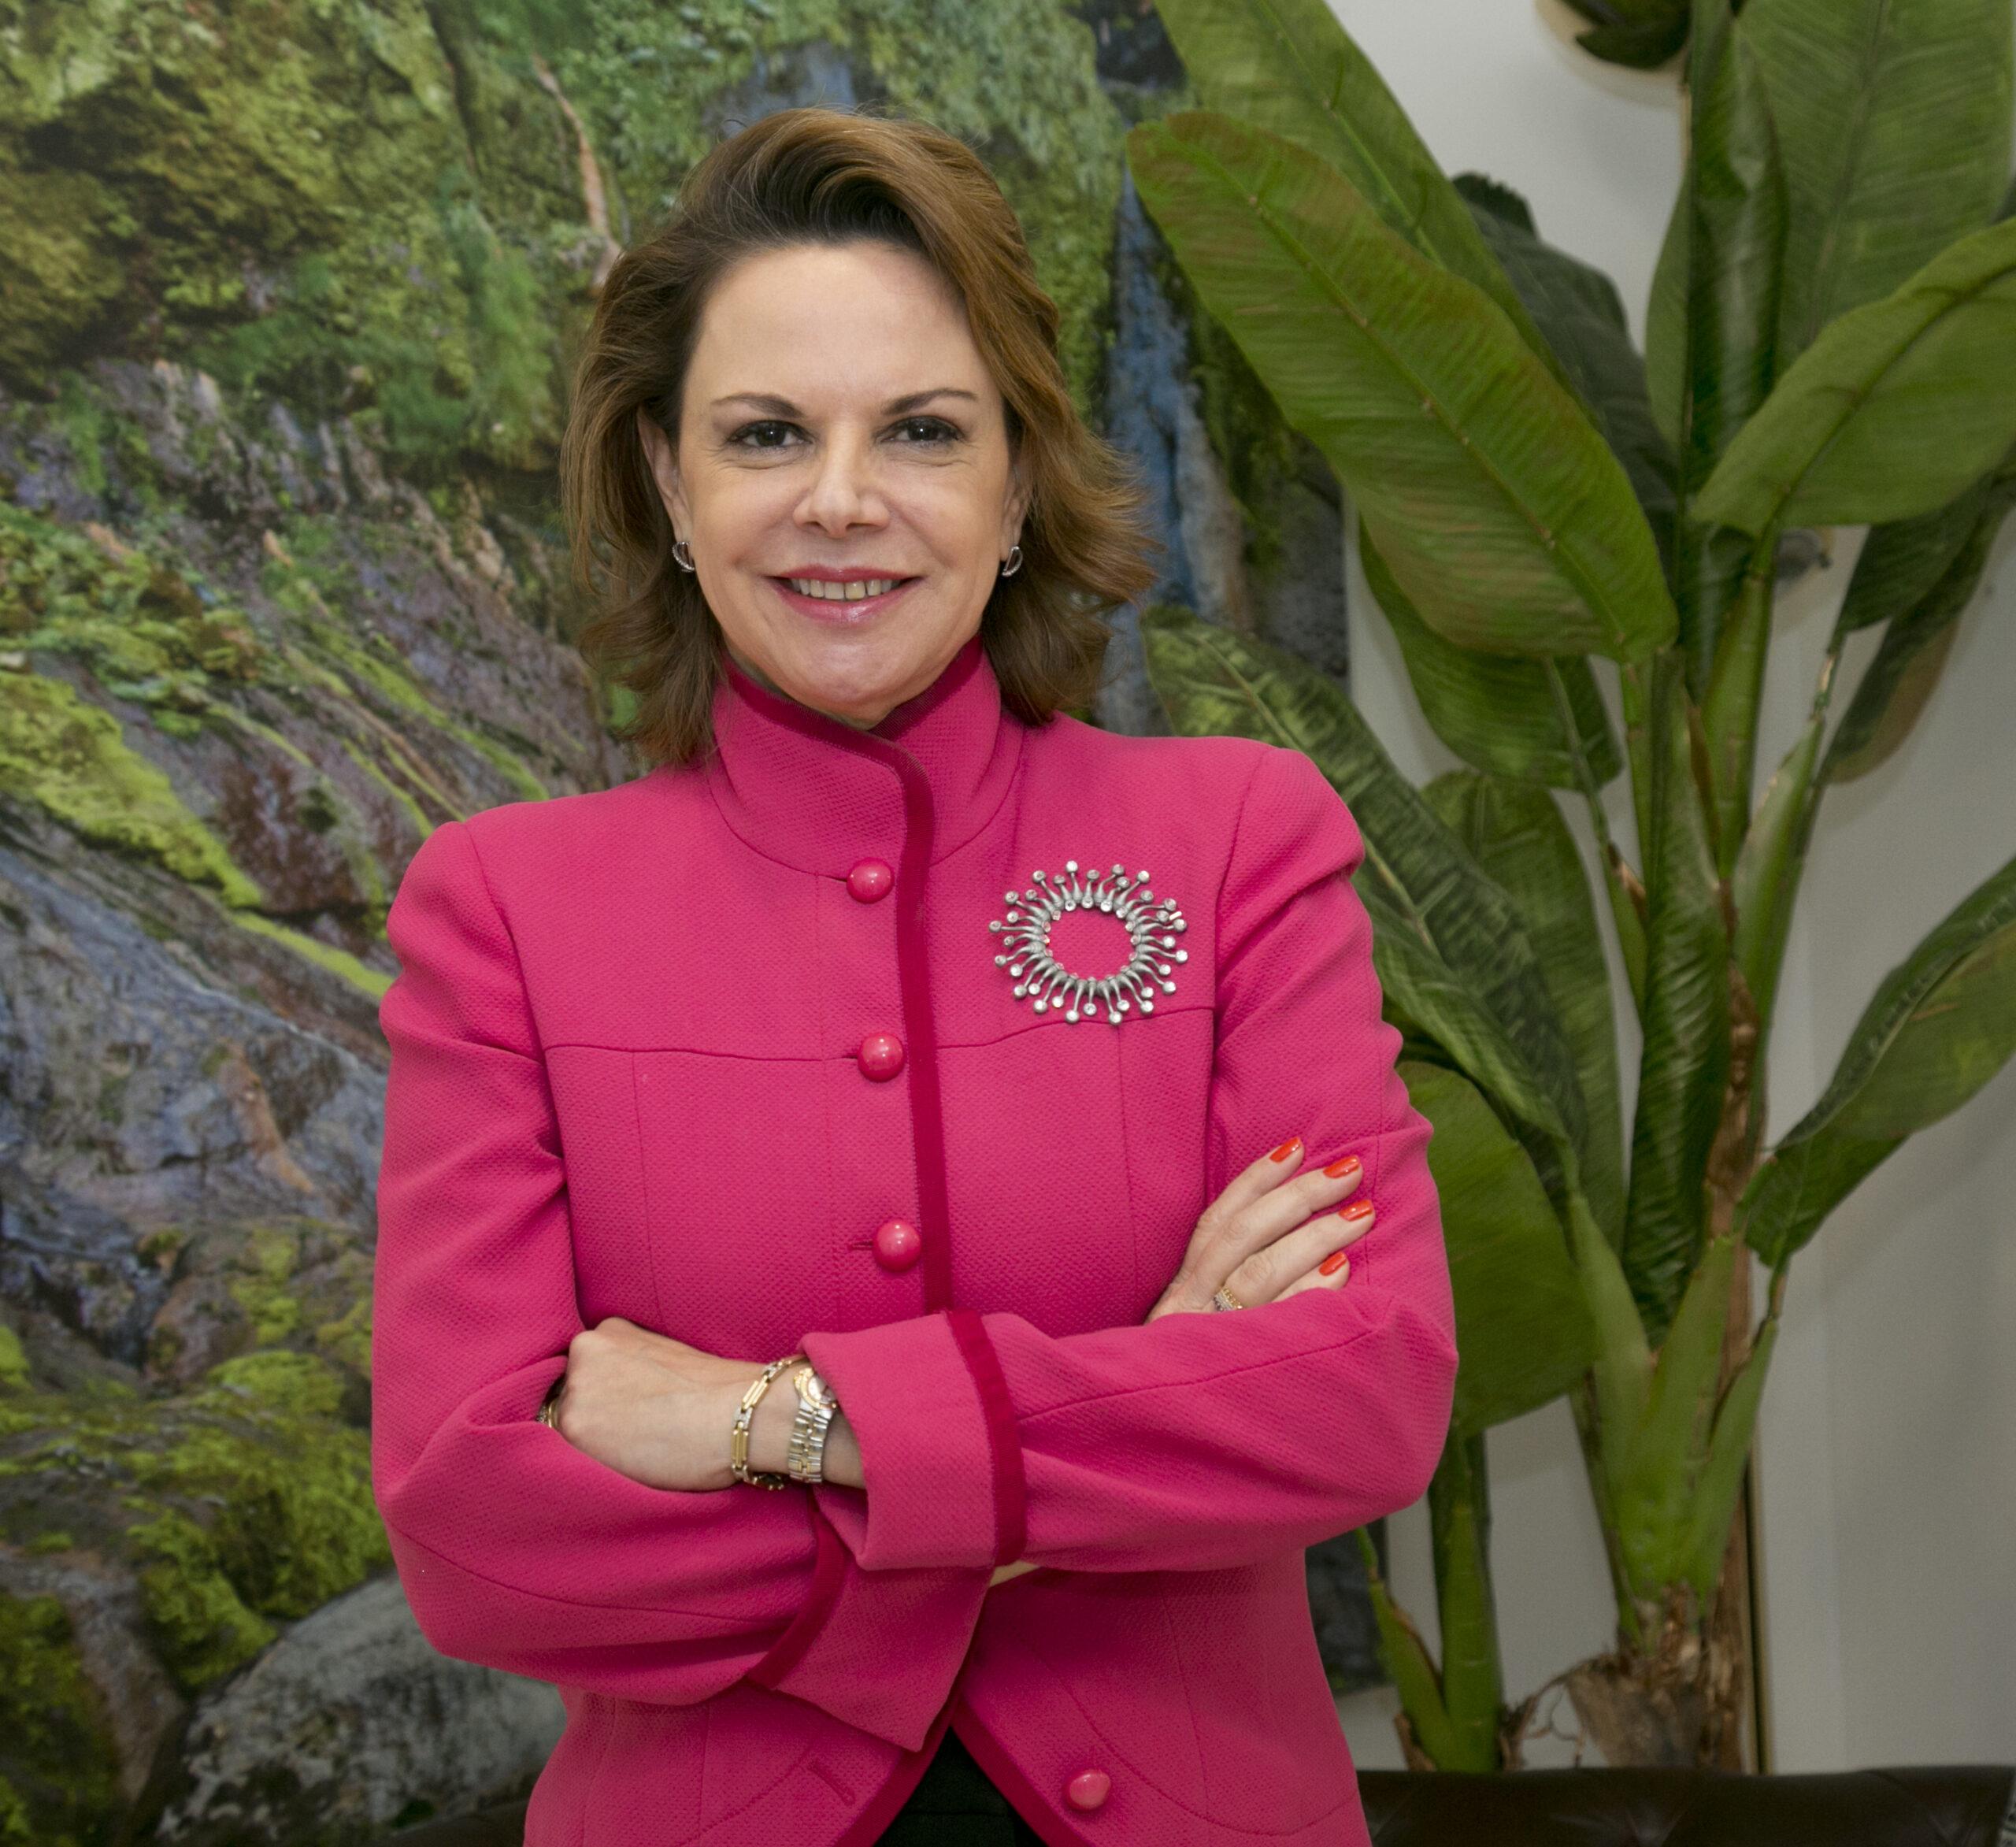 Ana Helena Chacón Echeverria